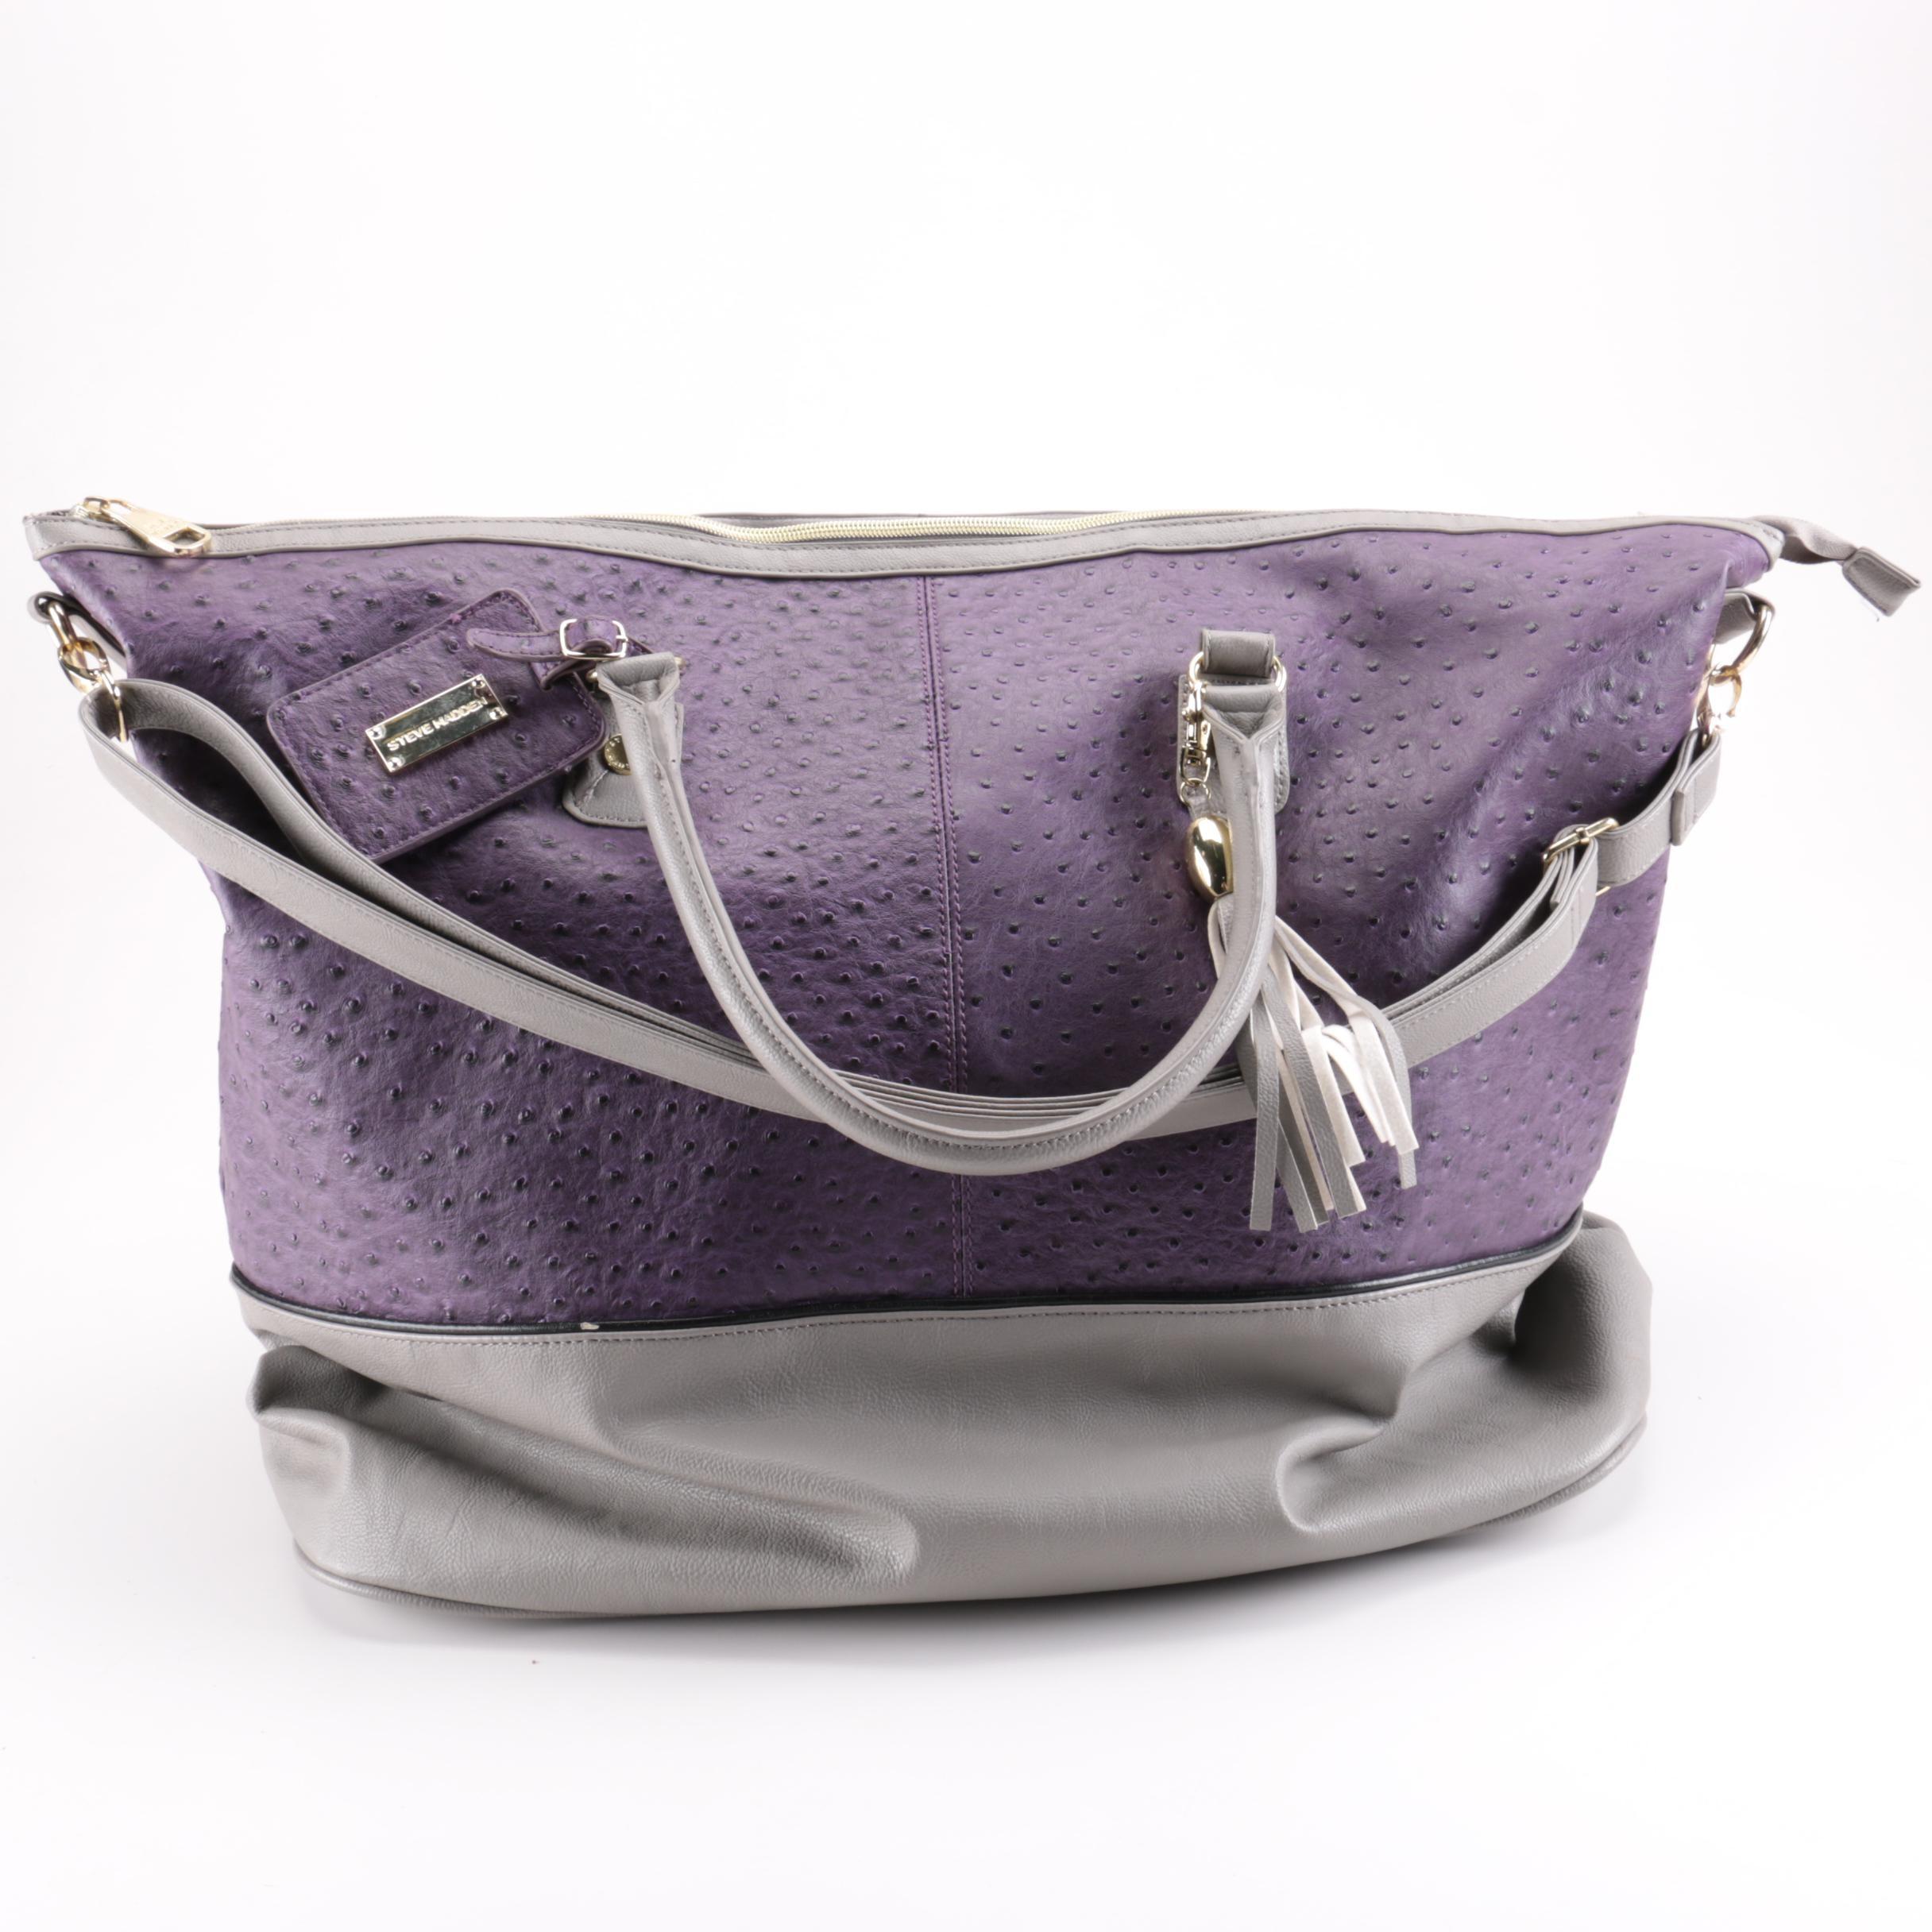 Steve Madden Embossed Ostrich Leather Handbag